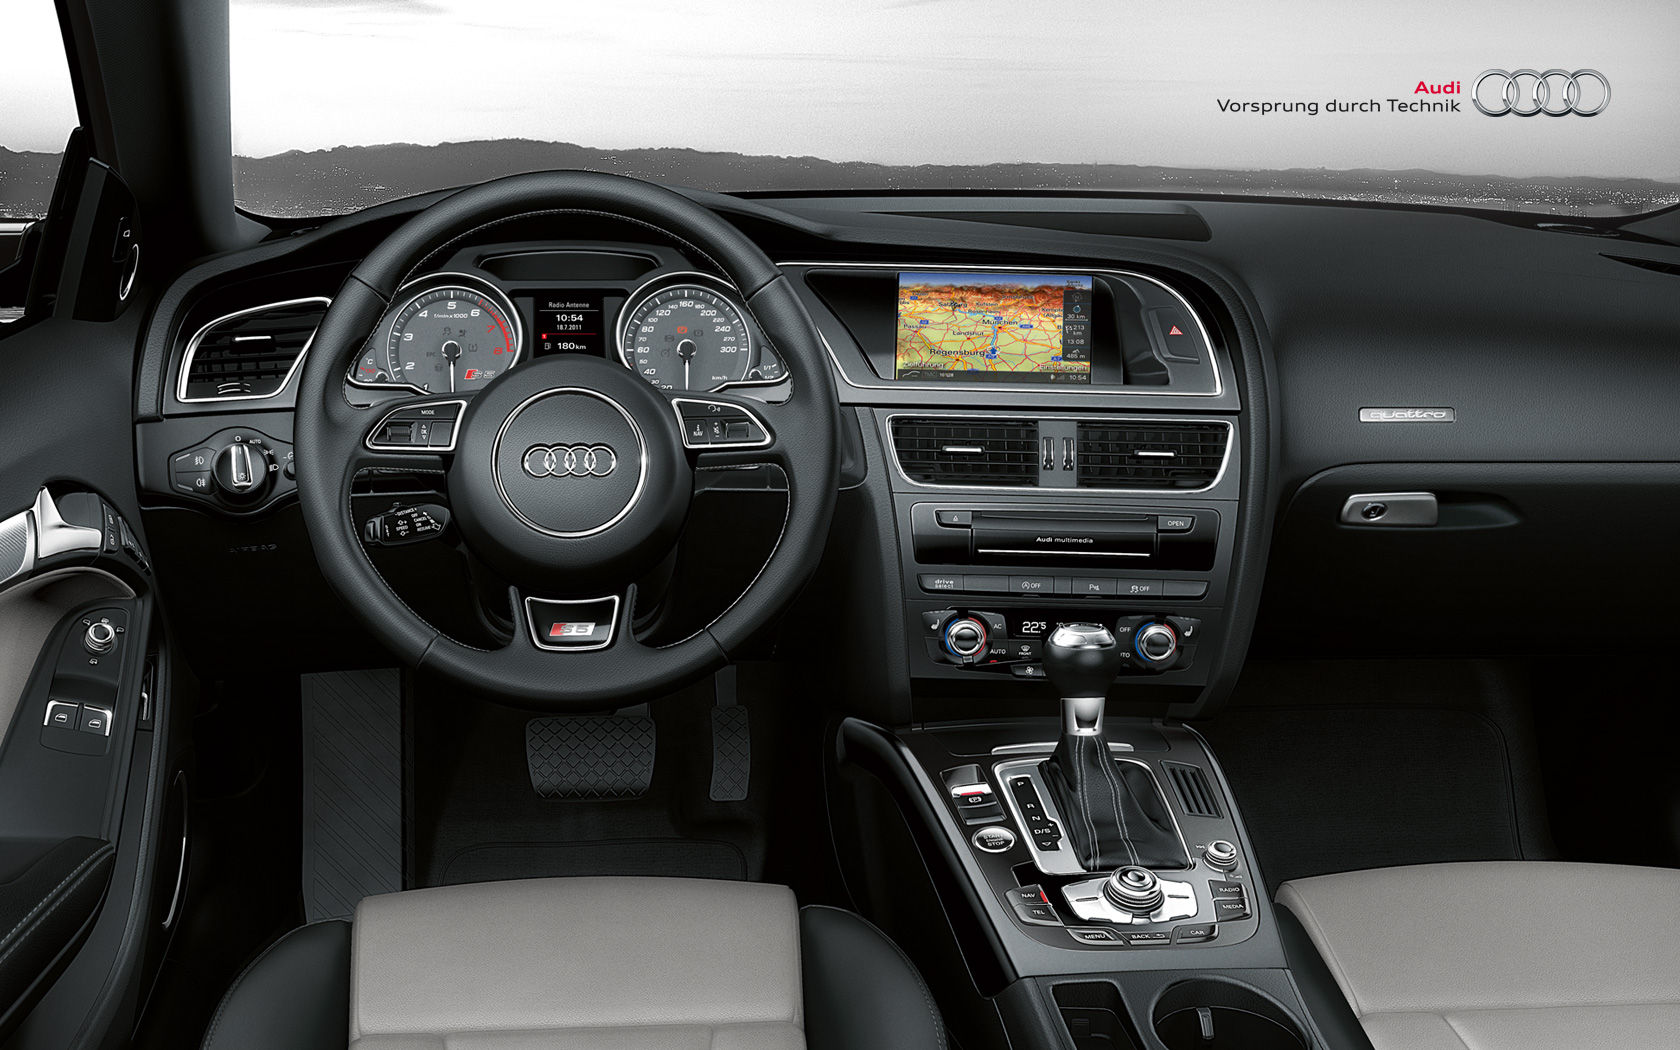 Audi S5 Coupe Specs Amp Photos 2012 2013 2014 2015 2016 Autoevolution